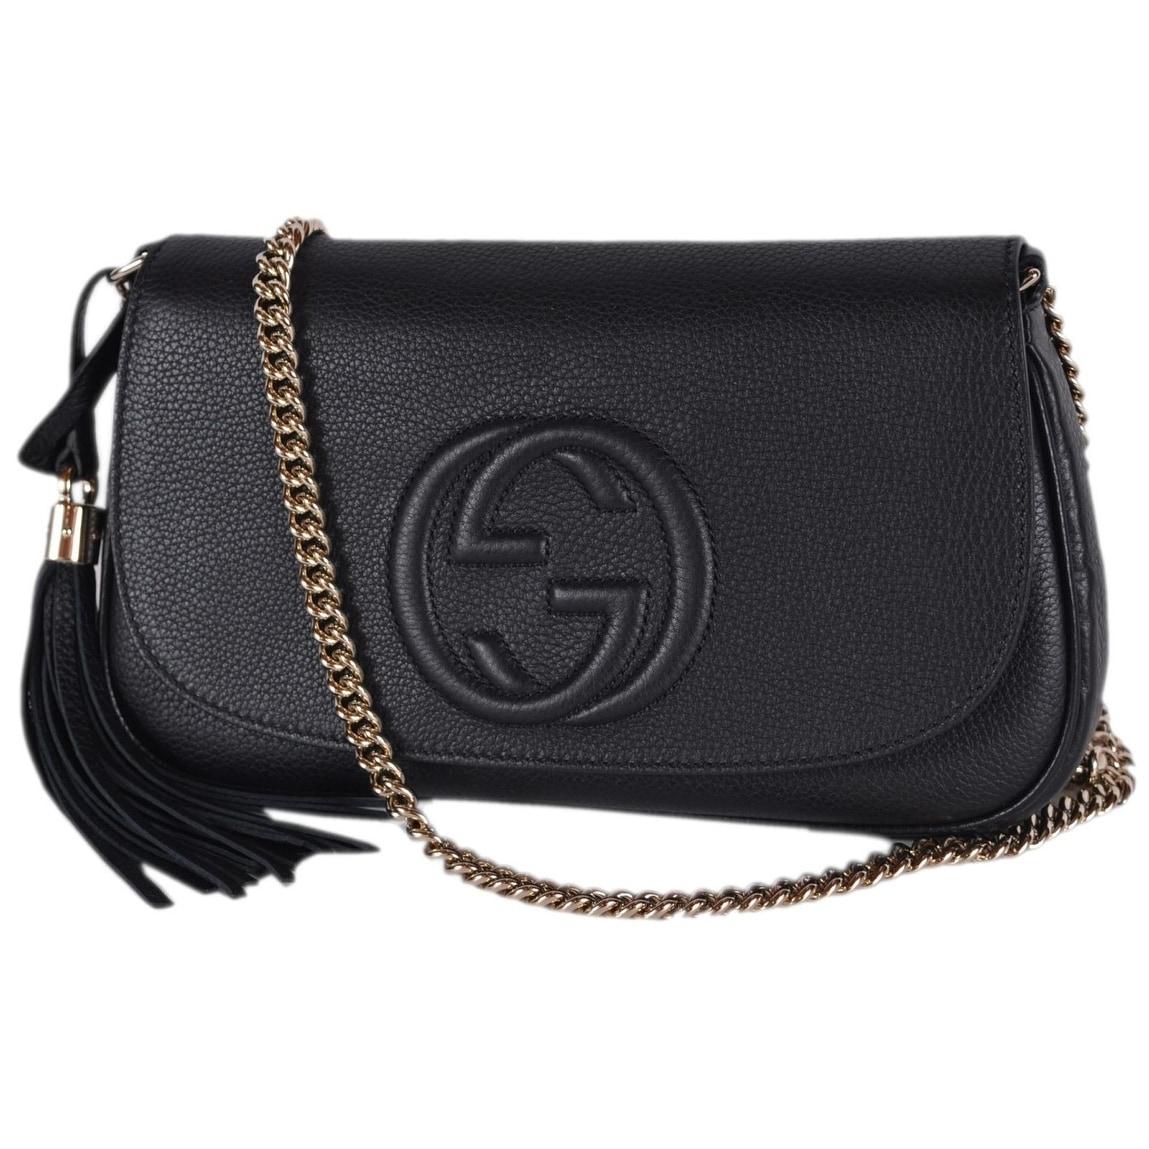 Gucci 536224 Black Leather SOHO Tassel Crossbody Purse Handbag